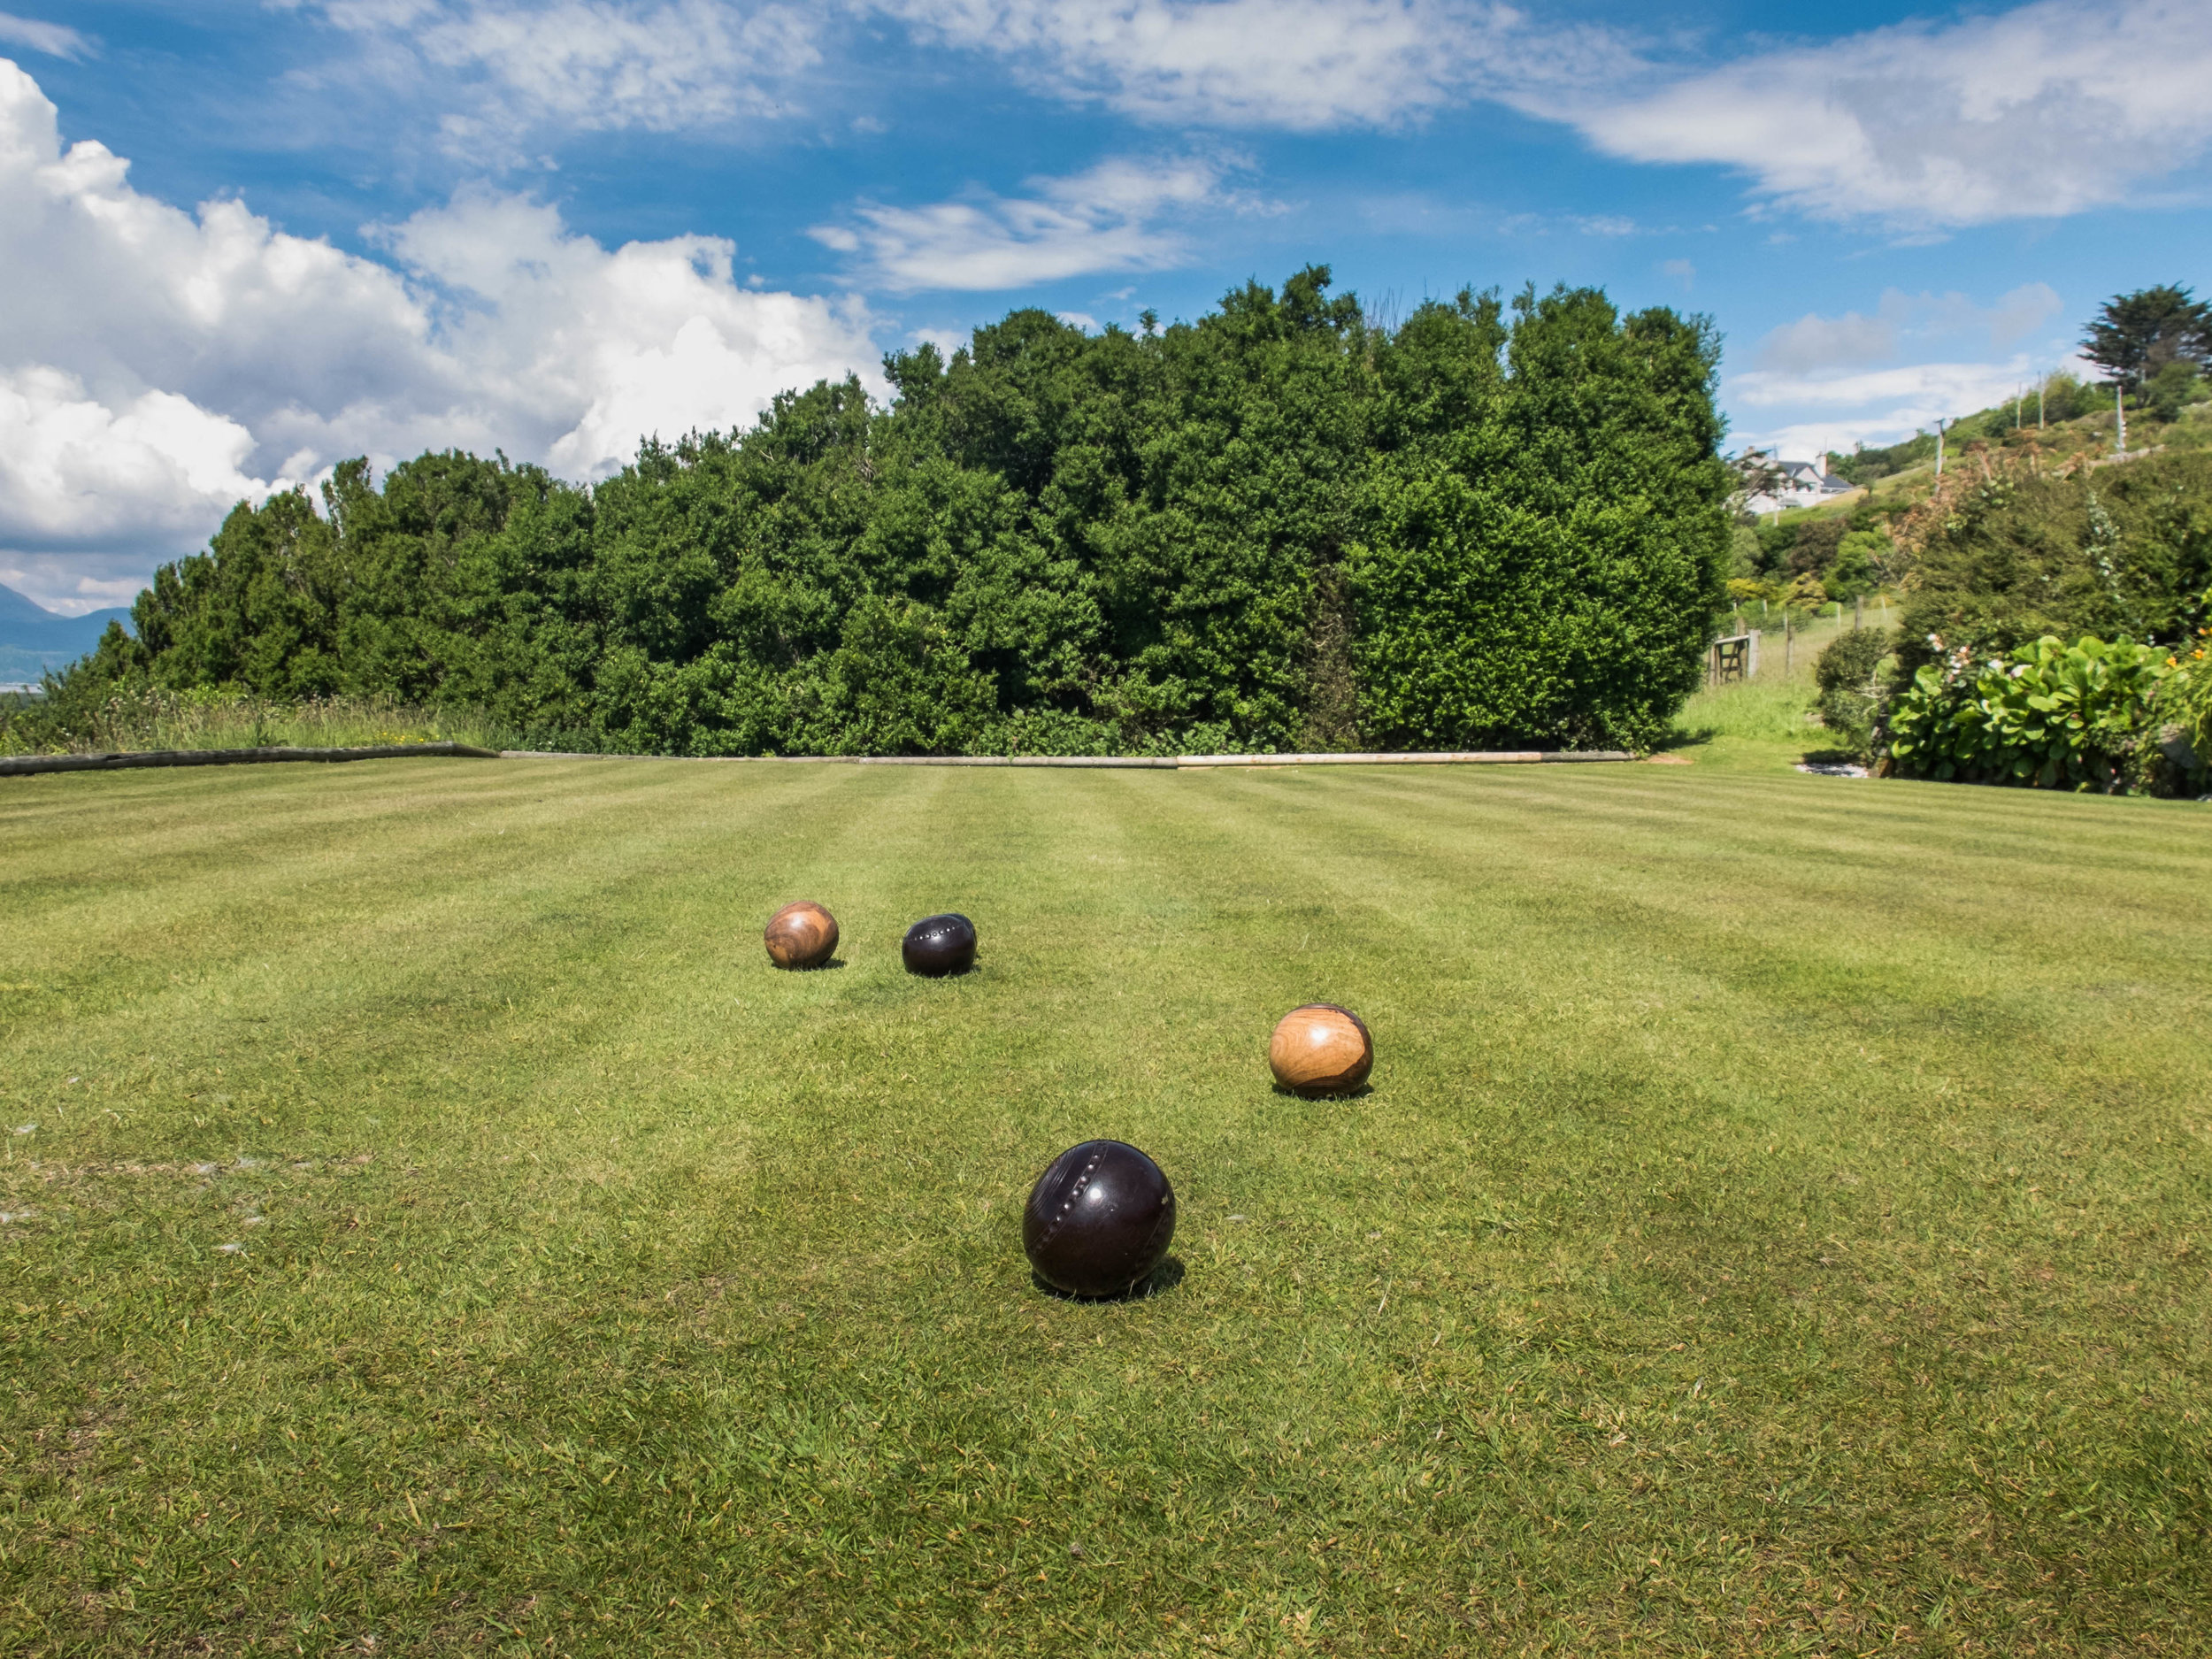 The Bowling Green at Hafod Wen